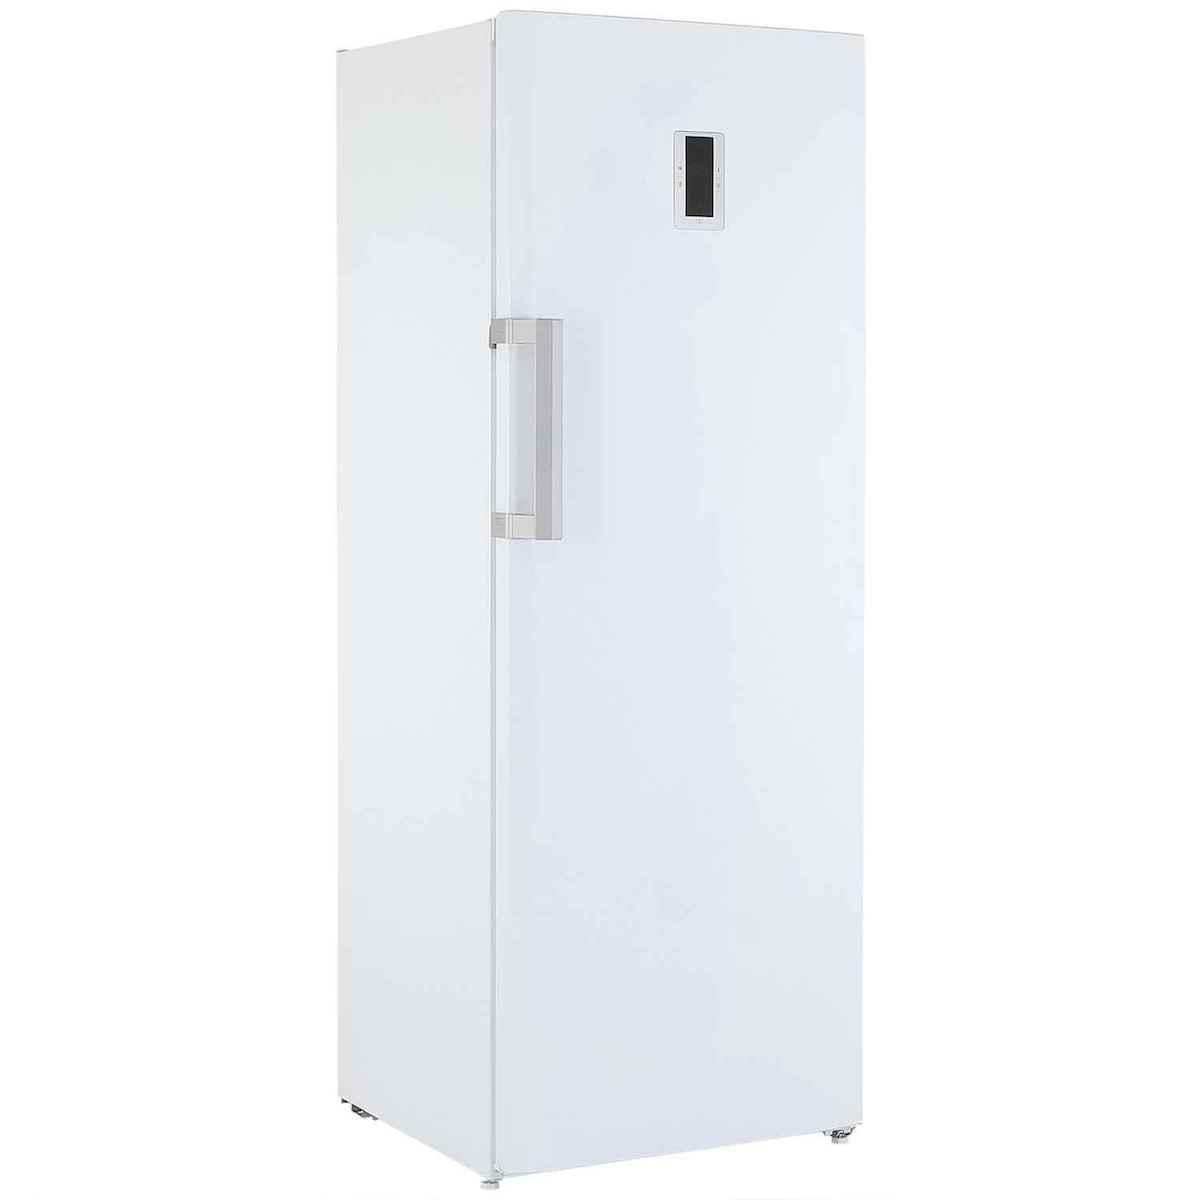 Image of Blomberg FNT9673P Tall Freezer